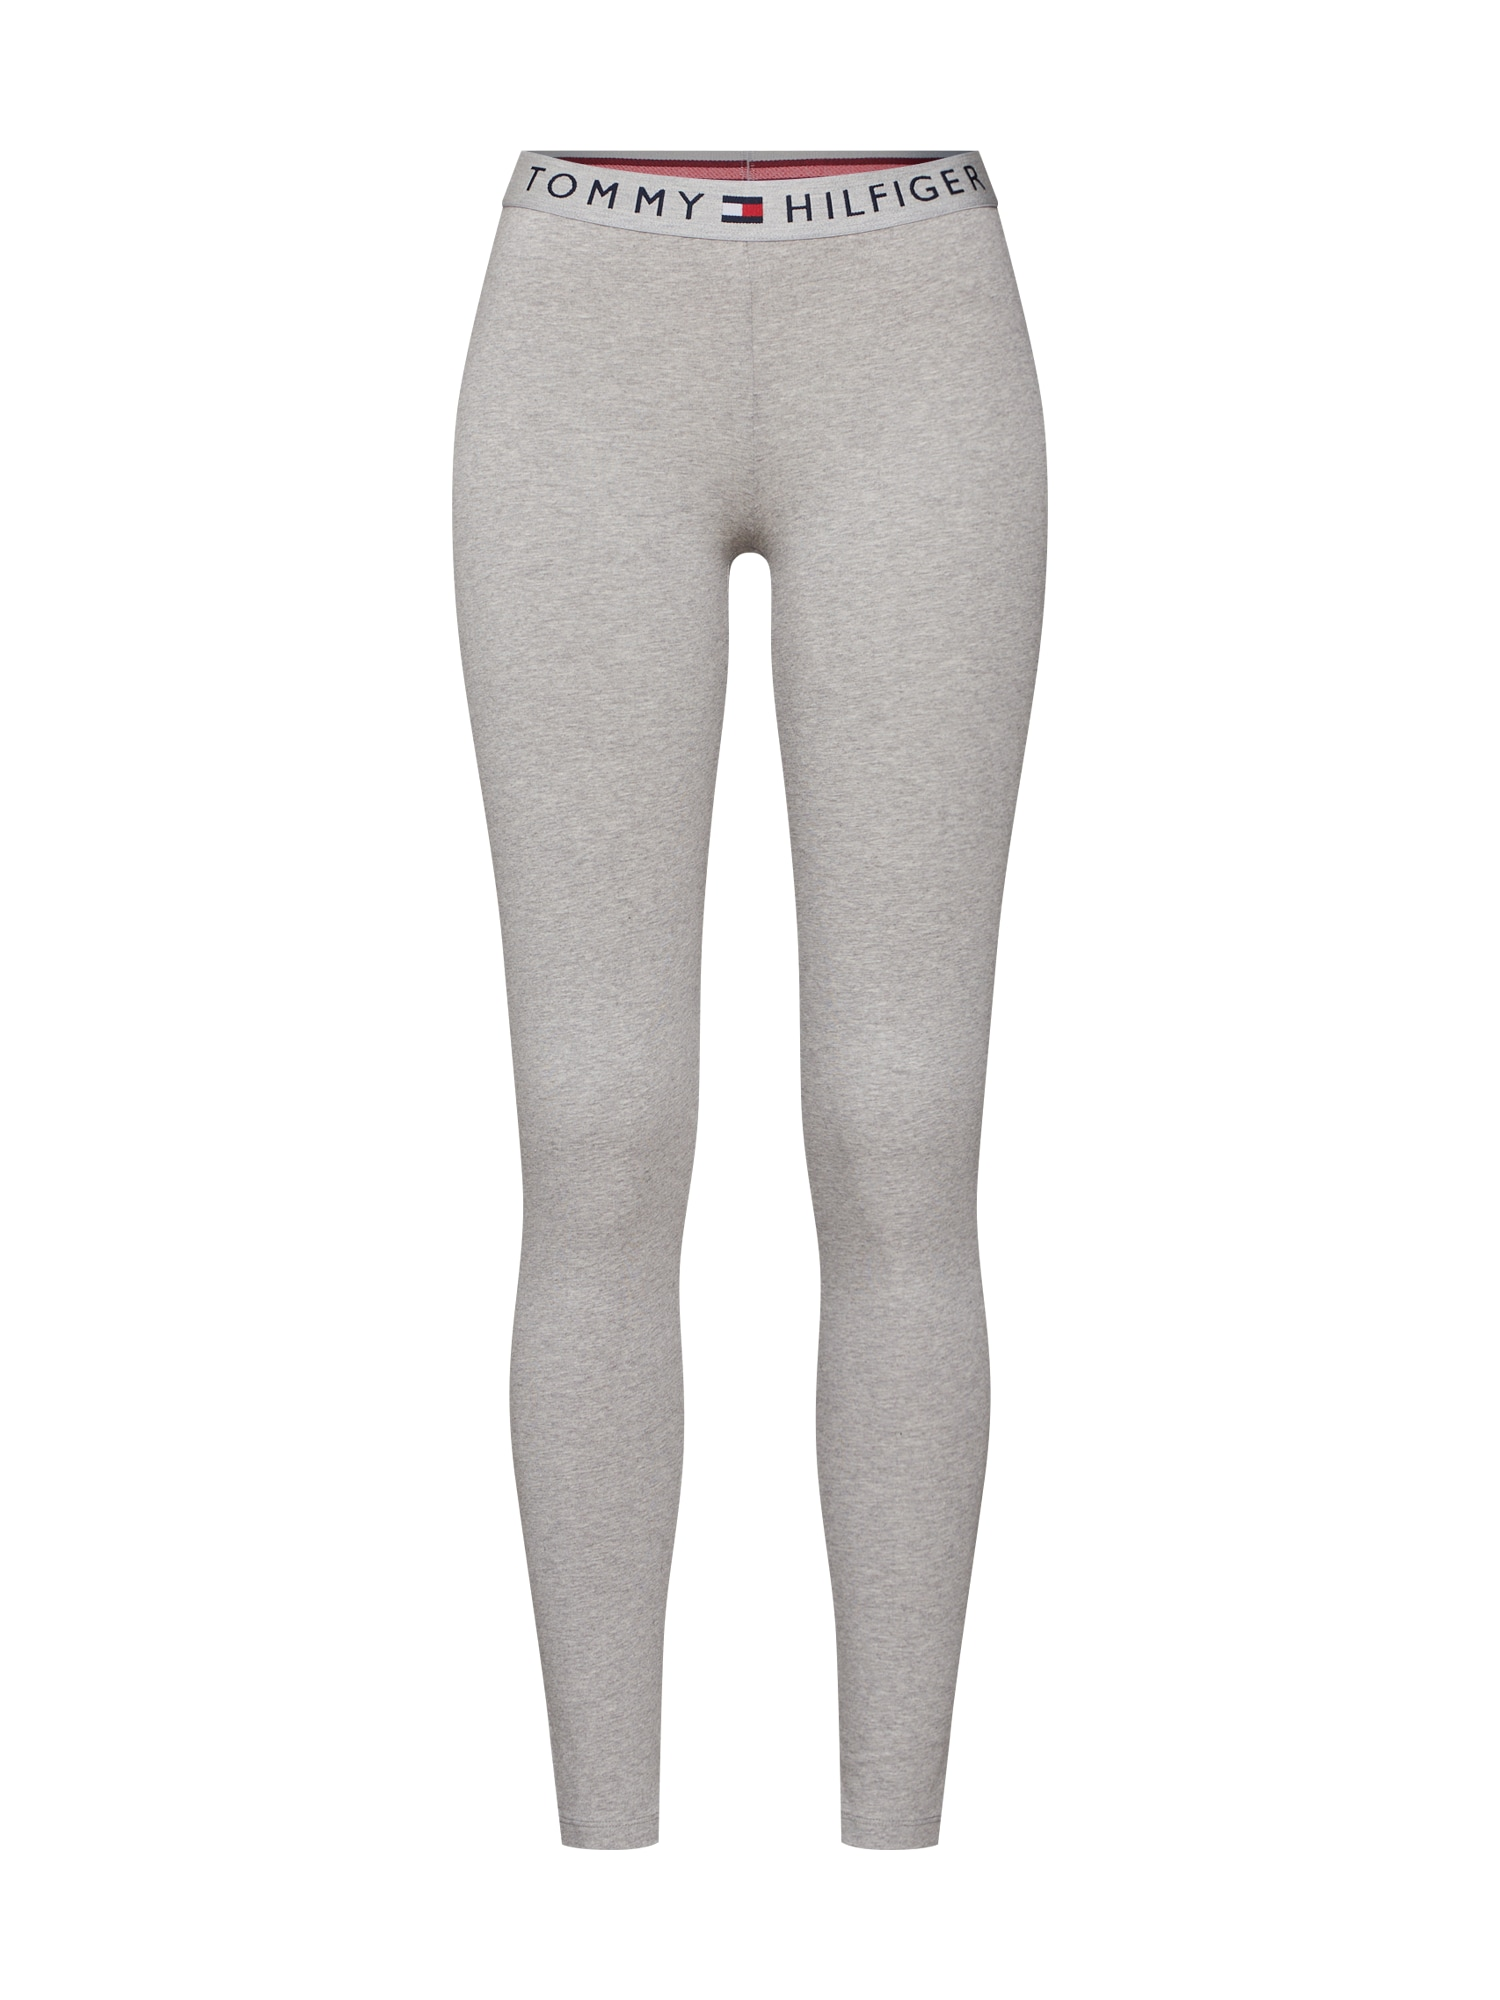 Tommy Hilfiger Underwear Pižaminės kelnės margai pilka